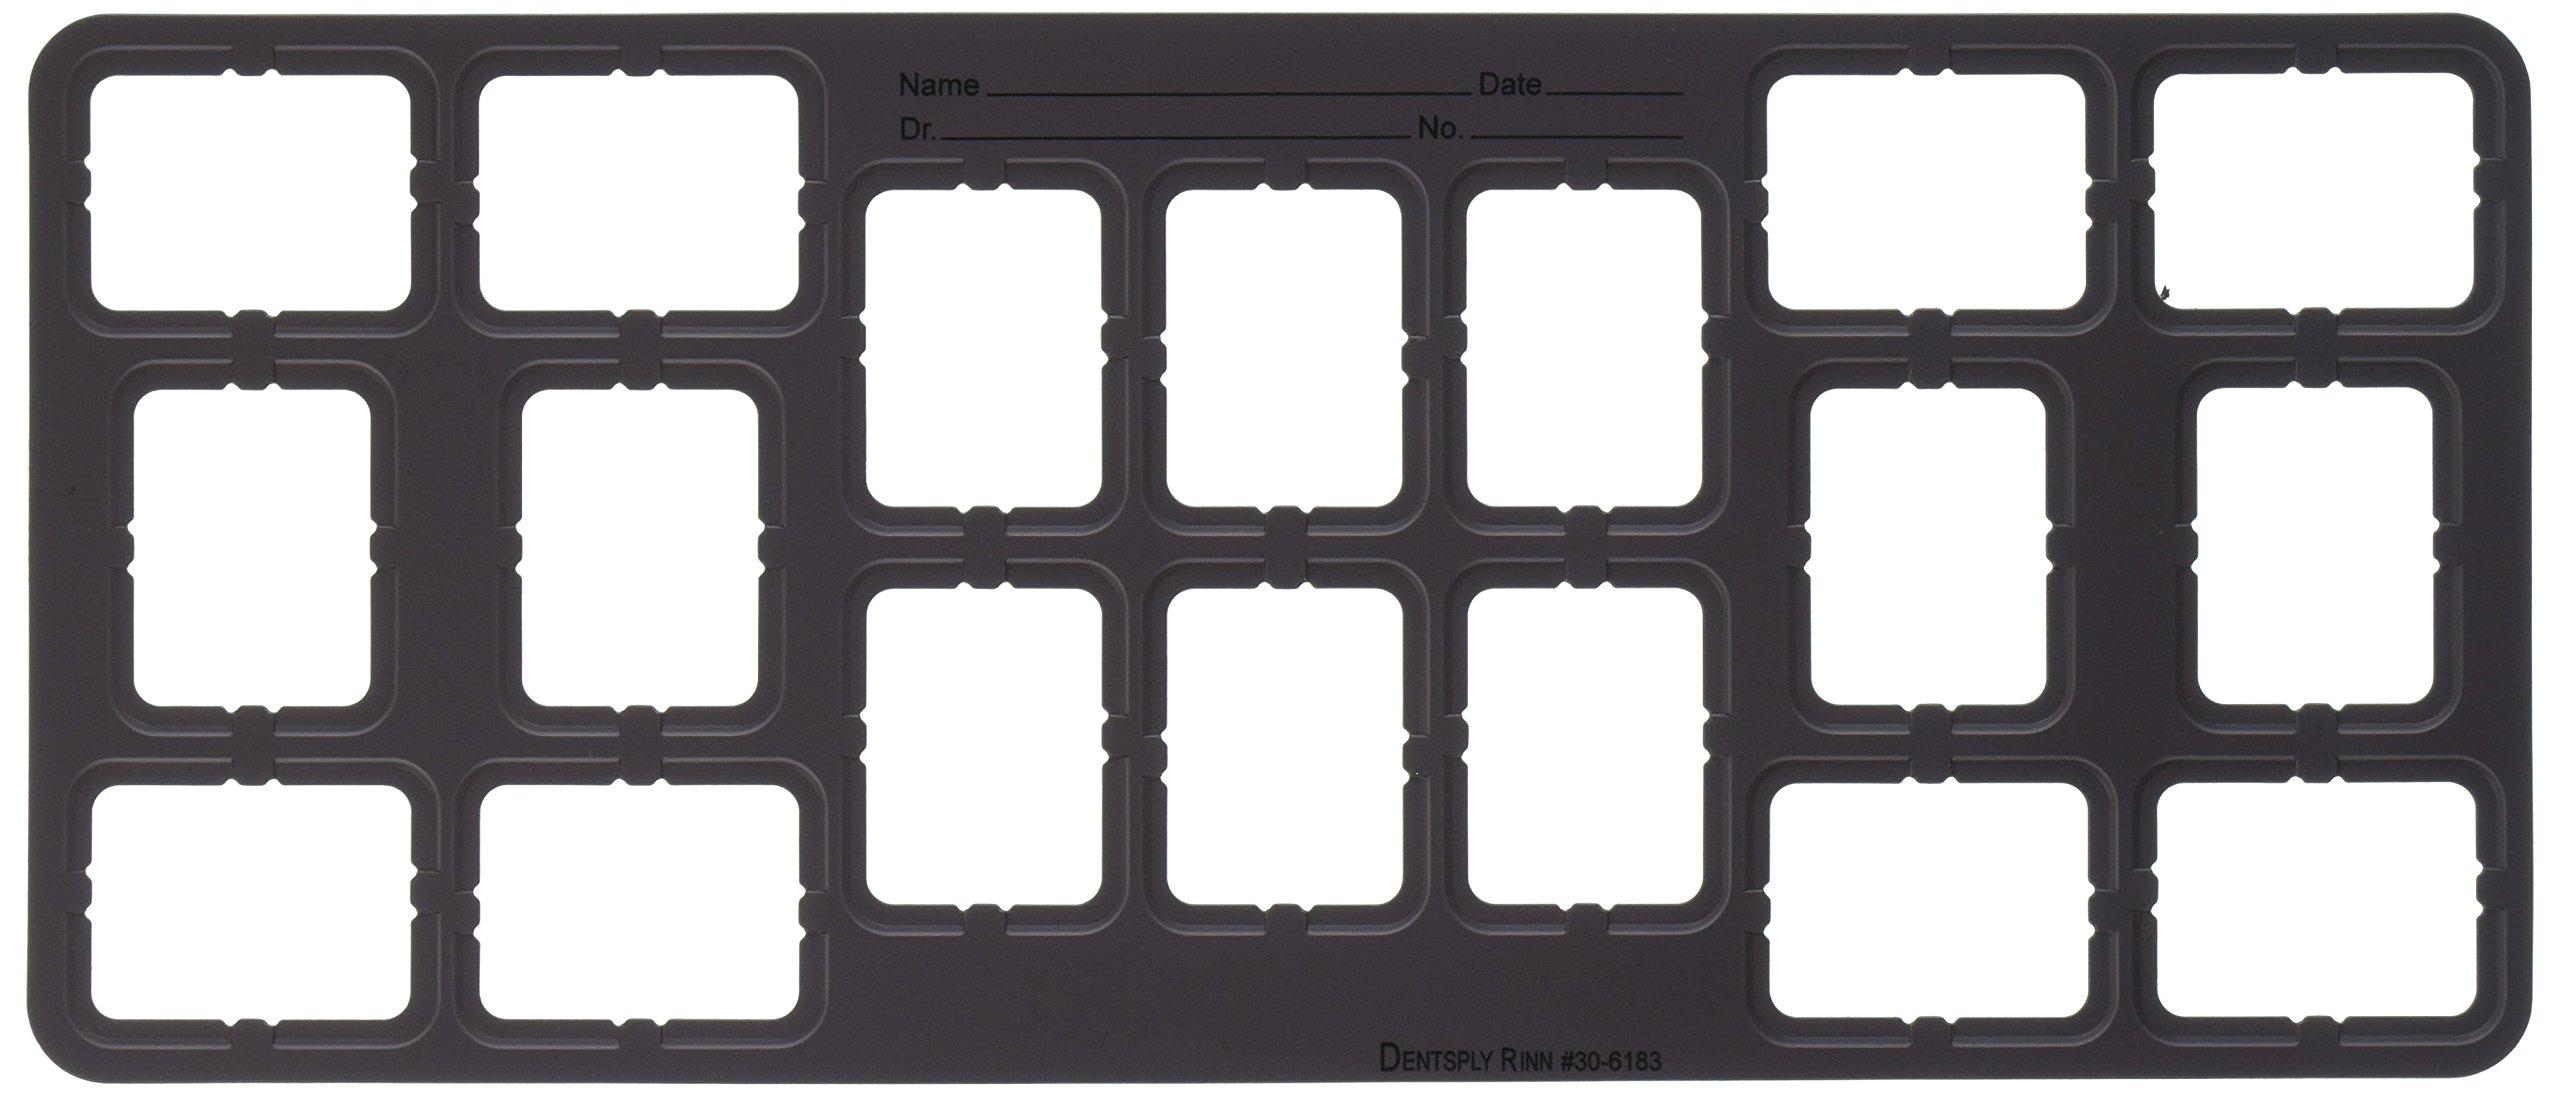 Dentsply 306183 EZ-Tab Plastic Series 30 Open Window, FMX #2, 8H, 6V, 4VBW, 124 mm Width, 289 mm Length, Grey (Pack of 100)